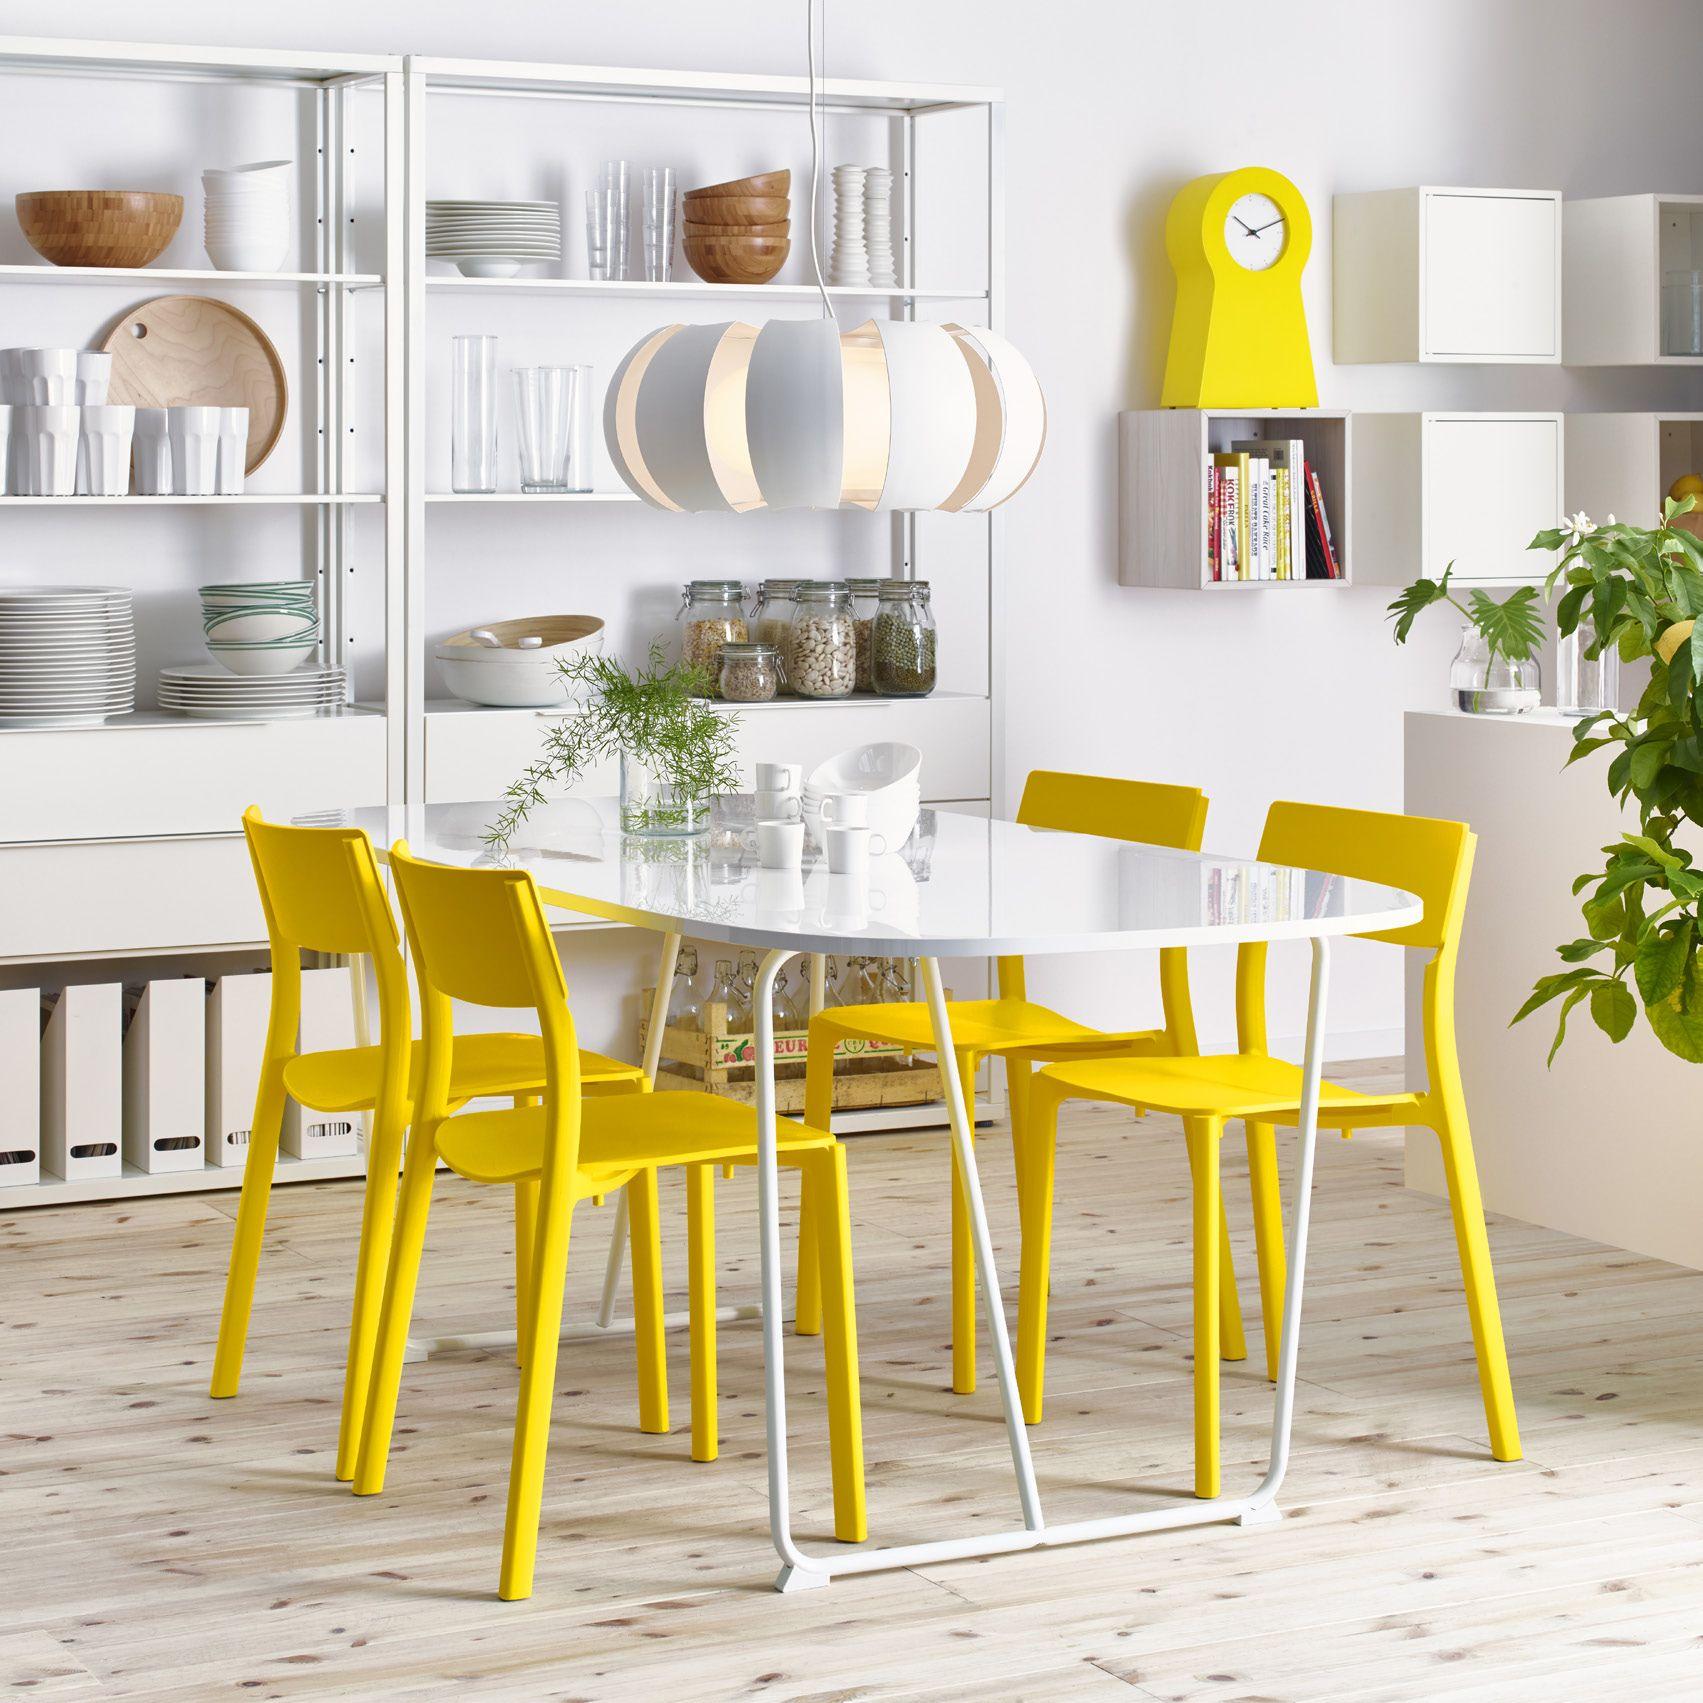 Moderne Witte Eettafel.Nederland Eetkamer Ikea Witte Eettafel En Tafel Ikea